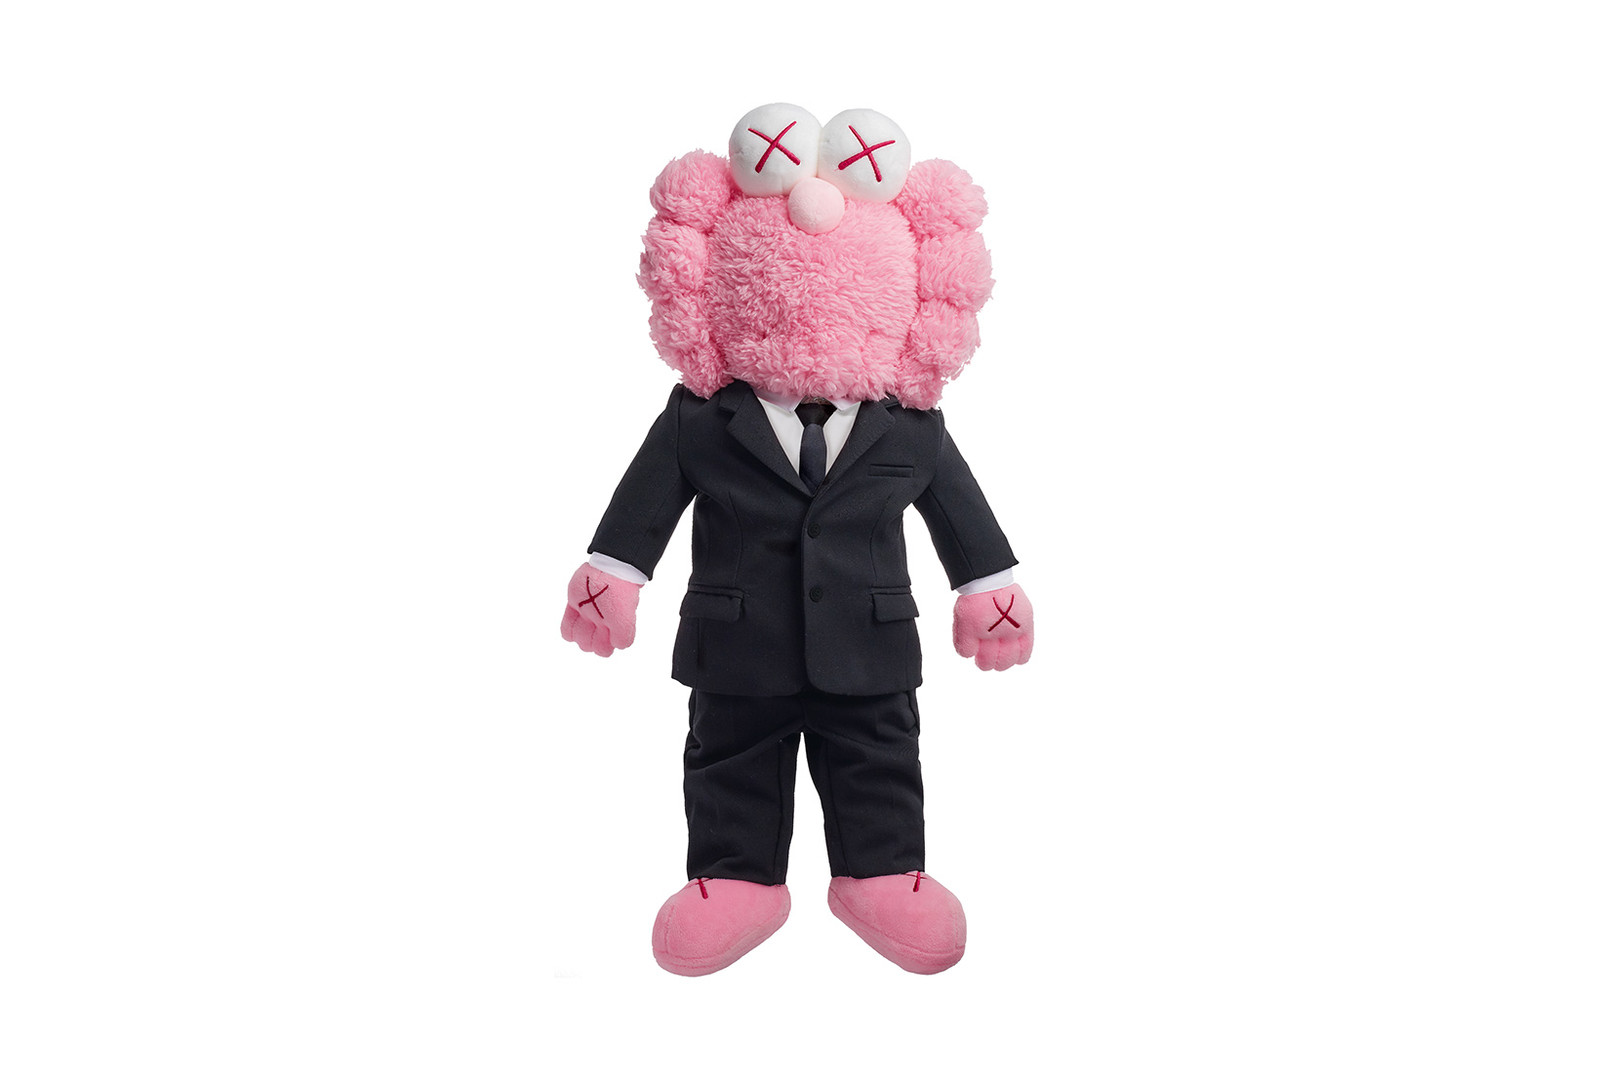 Dior Men KAWS Pink BFF Doll Kim Jones Spring Summer 2019 Homme Suit Art Design Fashion Collaboration